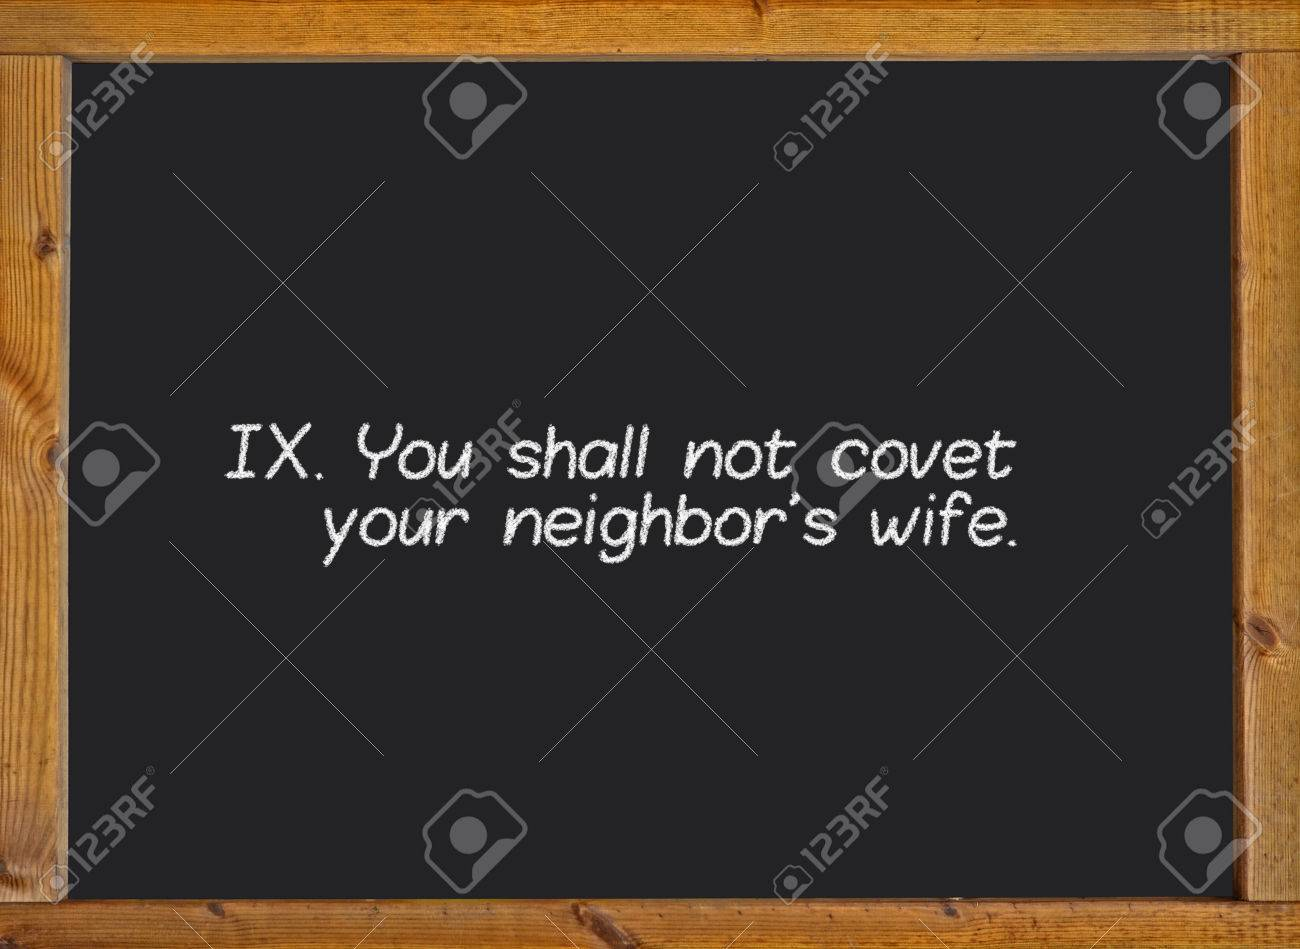 The Ninth Commandment Of Christian Catholic On A Blackboard Stock ...